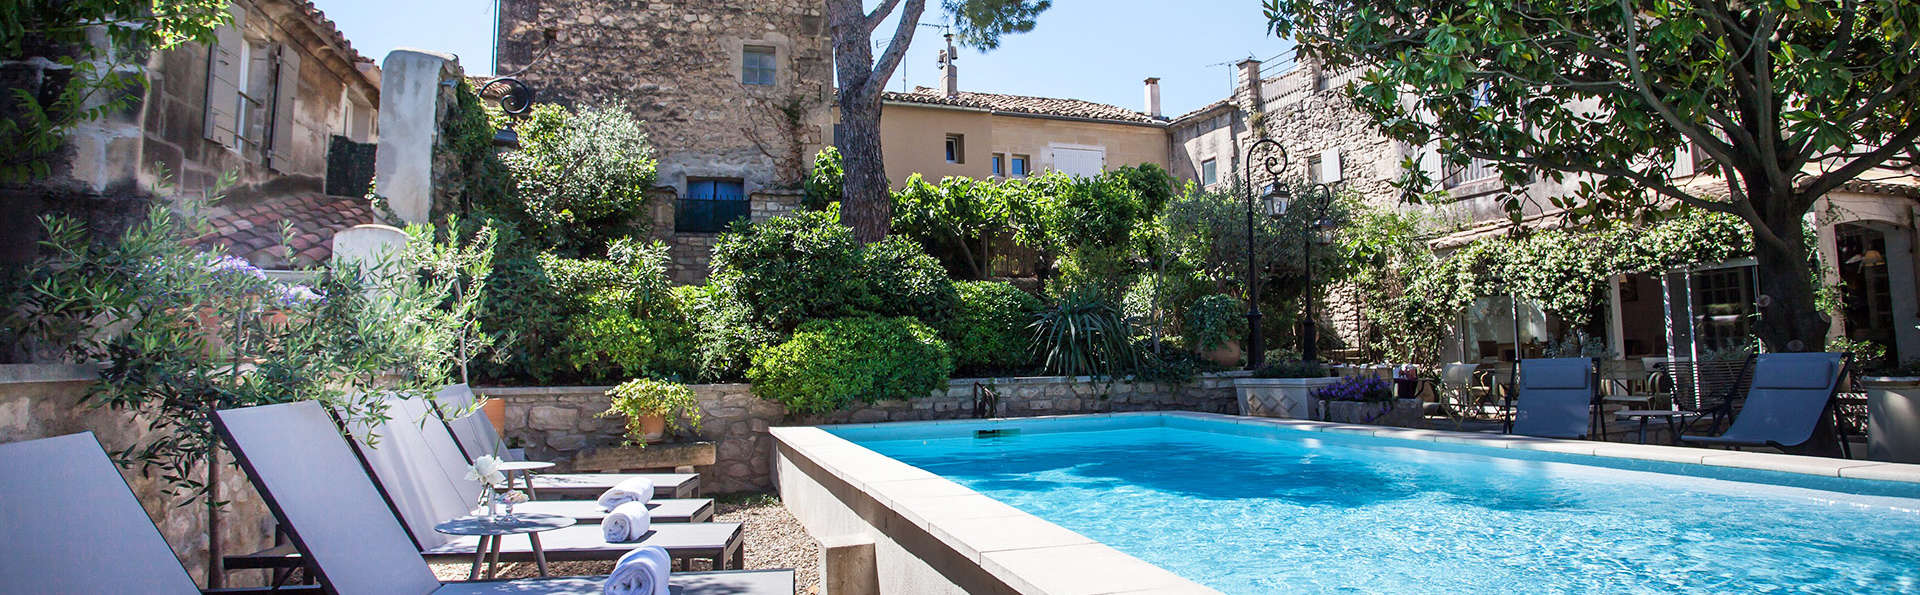 Villa Regalido - EDIT_pool3.jpg